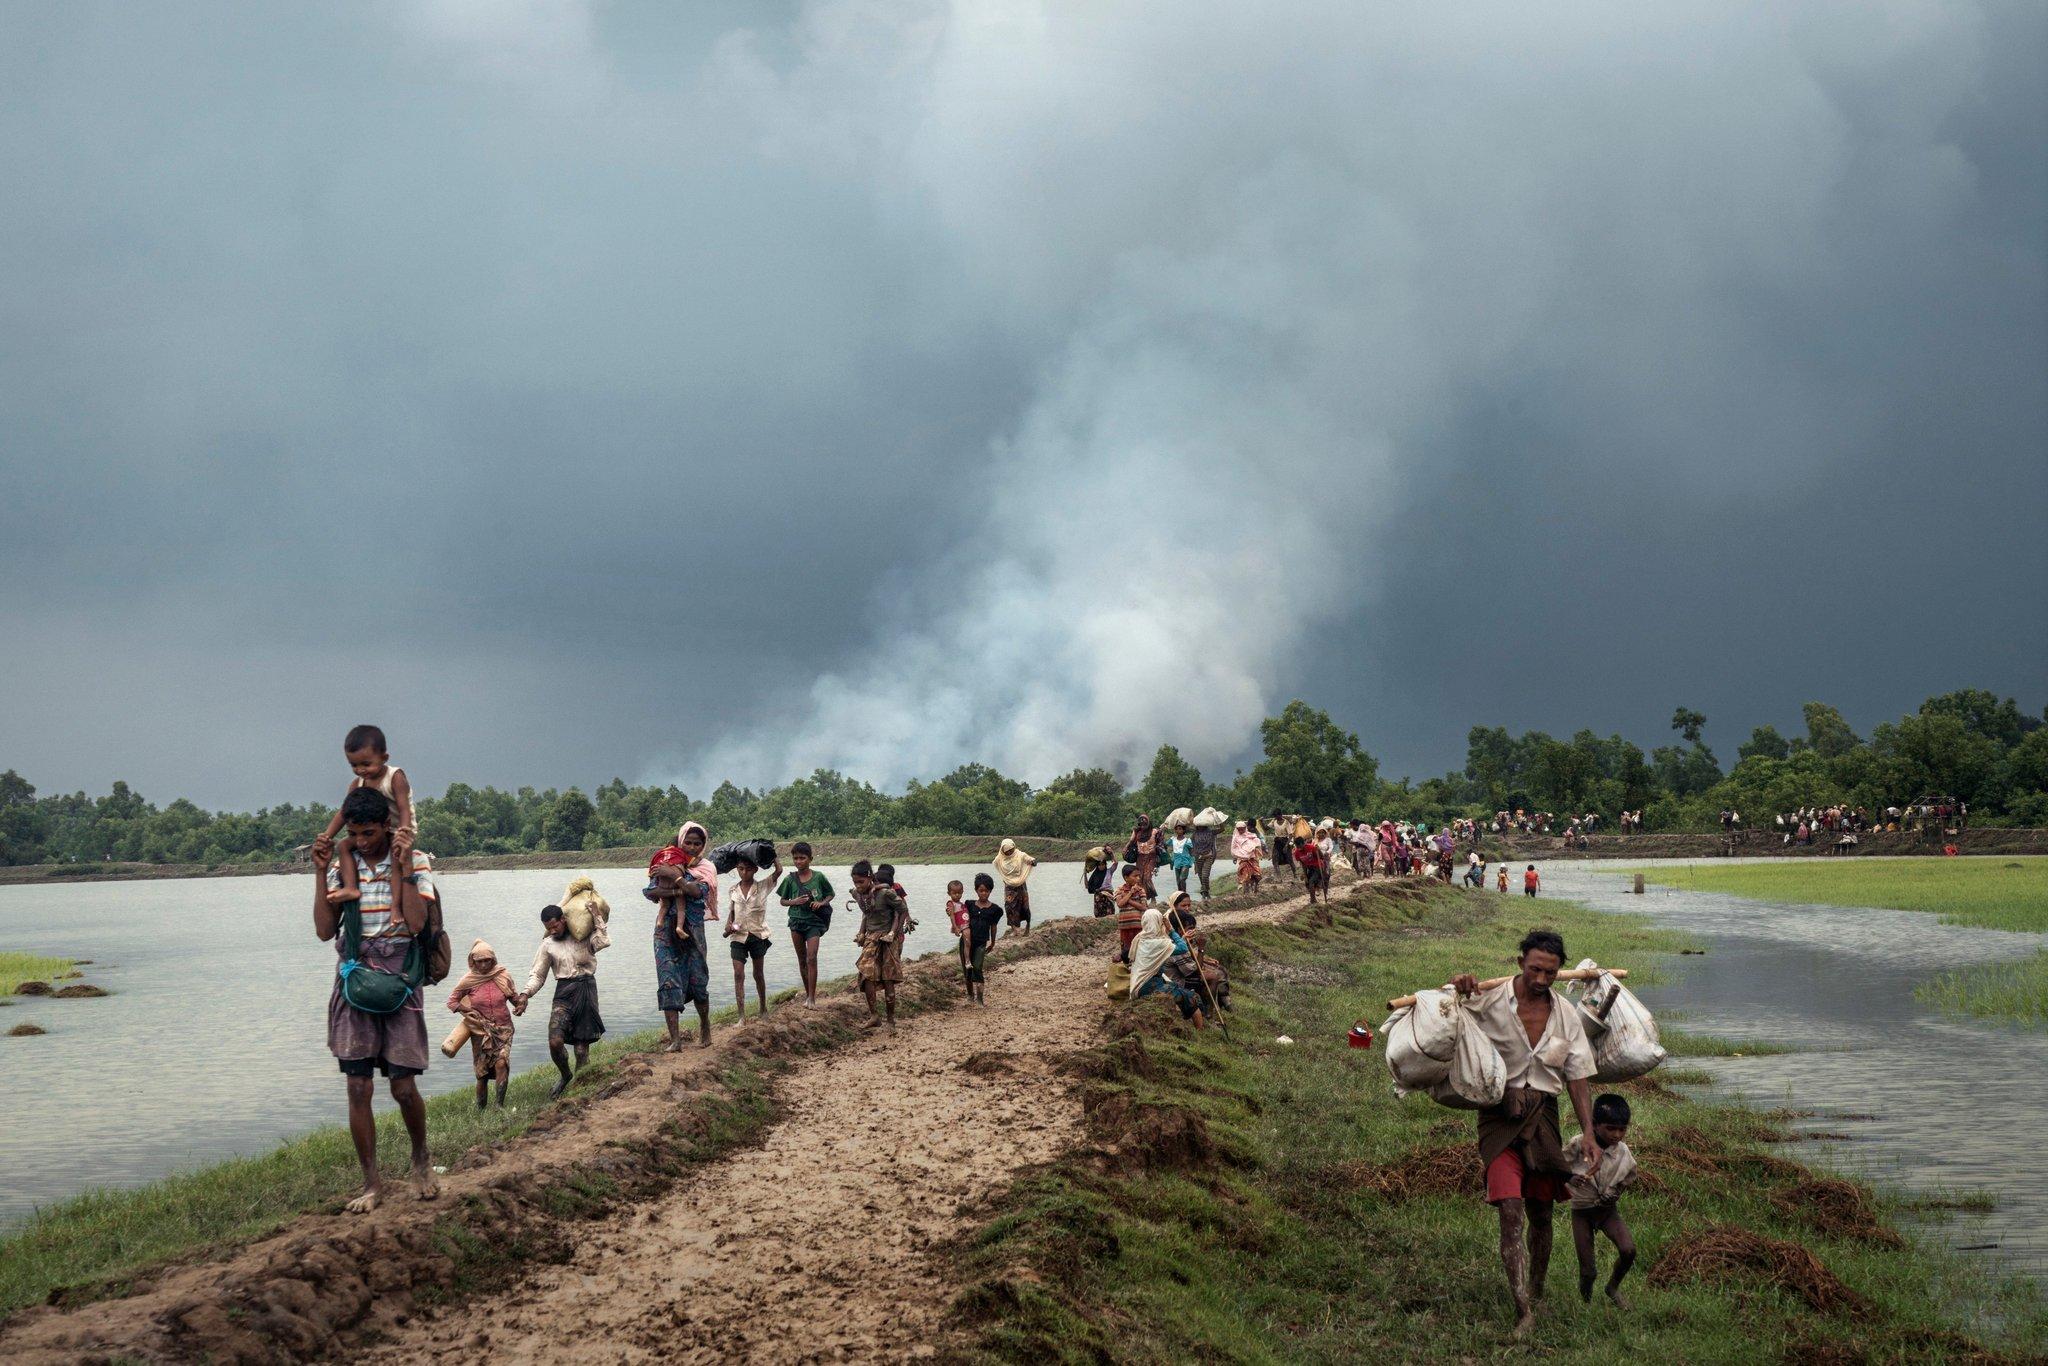 The Rohingya: Statelessness, Refugeehood and a 'Subhuman' Life, by Nasir Uddin